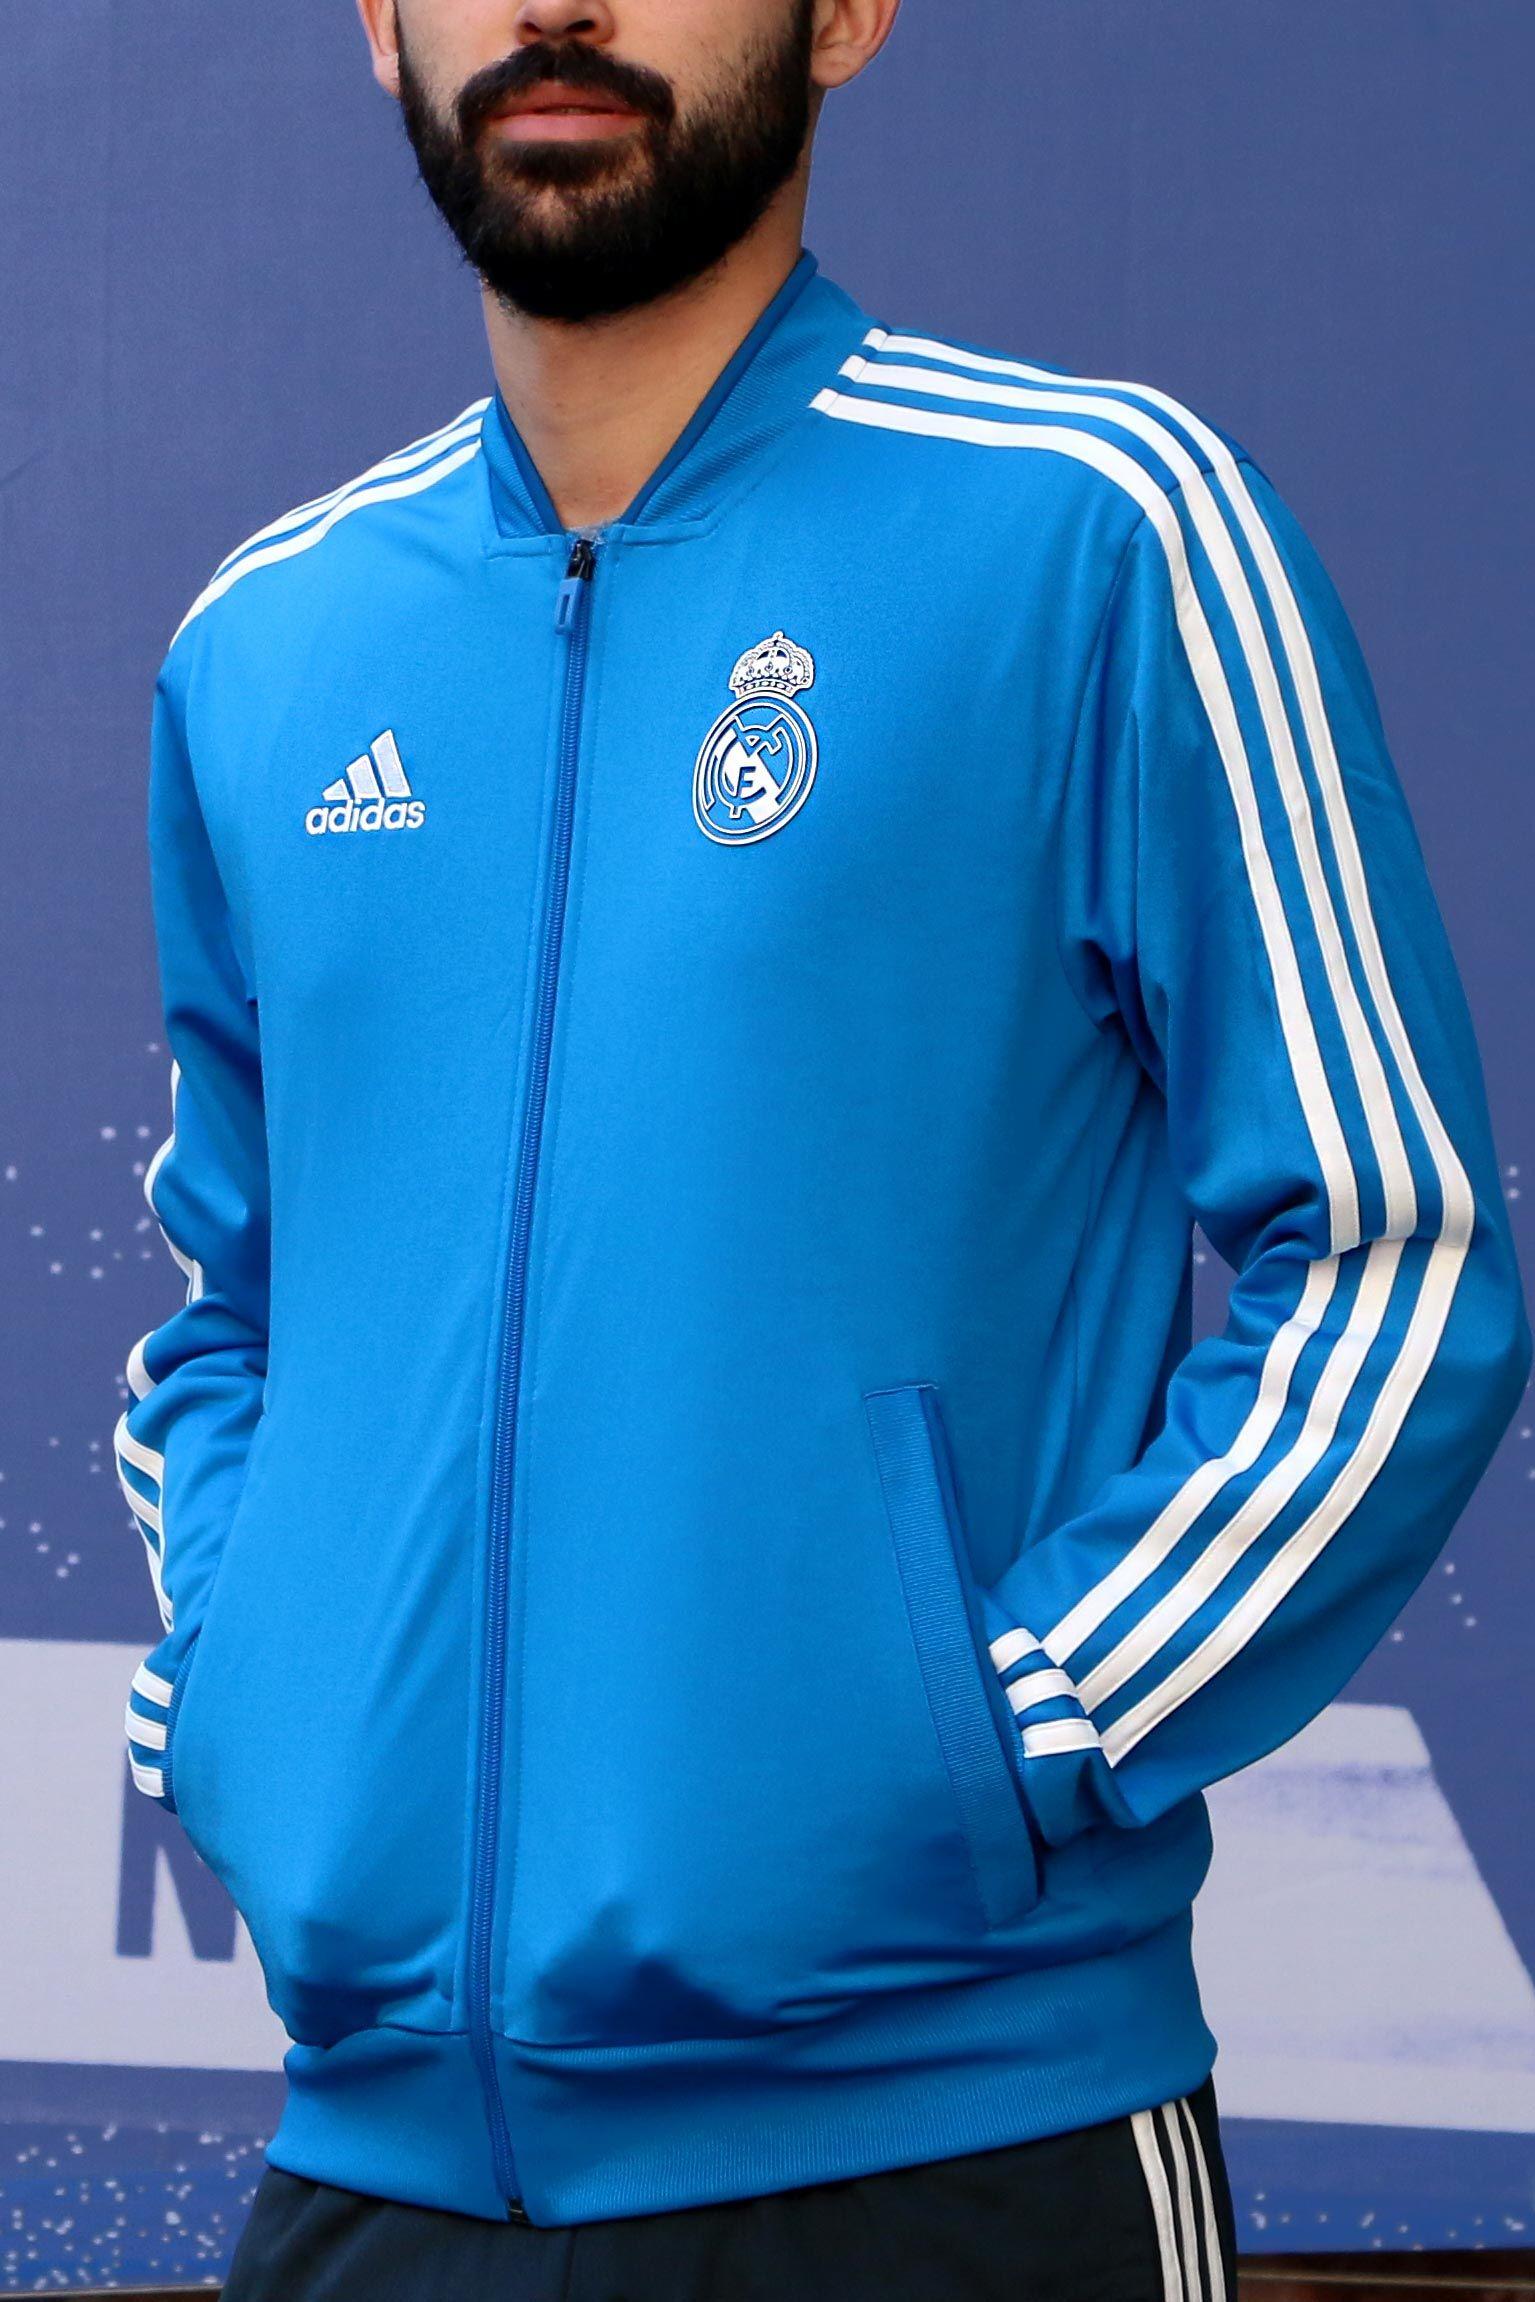 Conjunto de chándal Real Madrid 2018 2019 - azul celeste y negro  adidas   realmadrid 07908e24db9